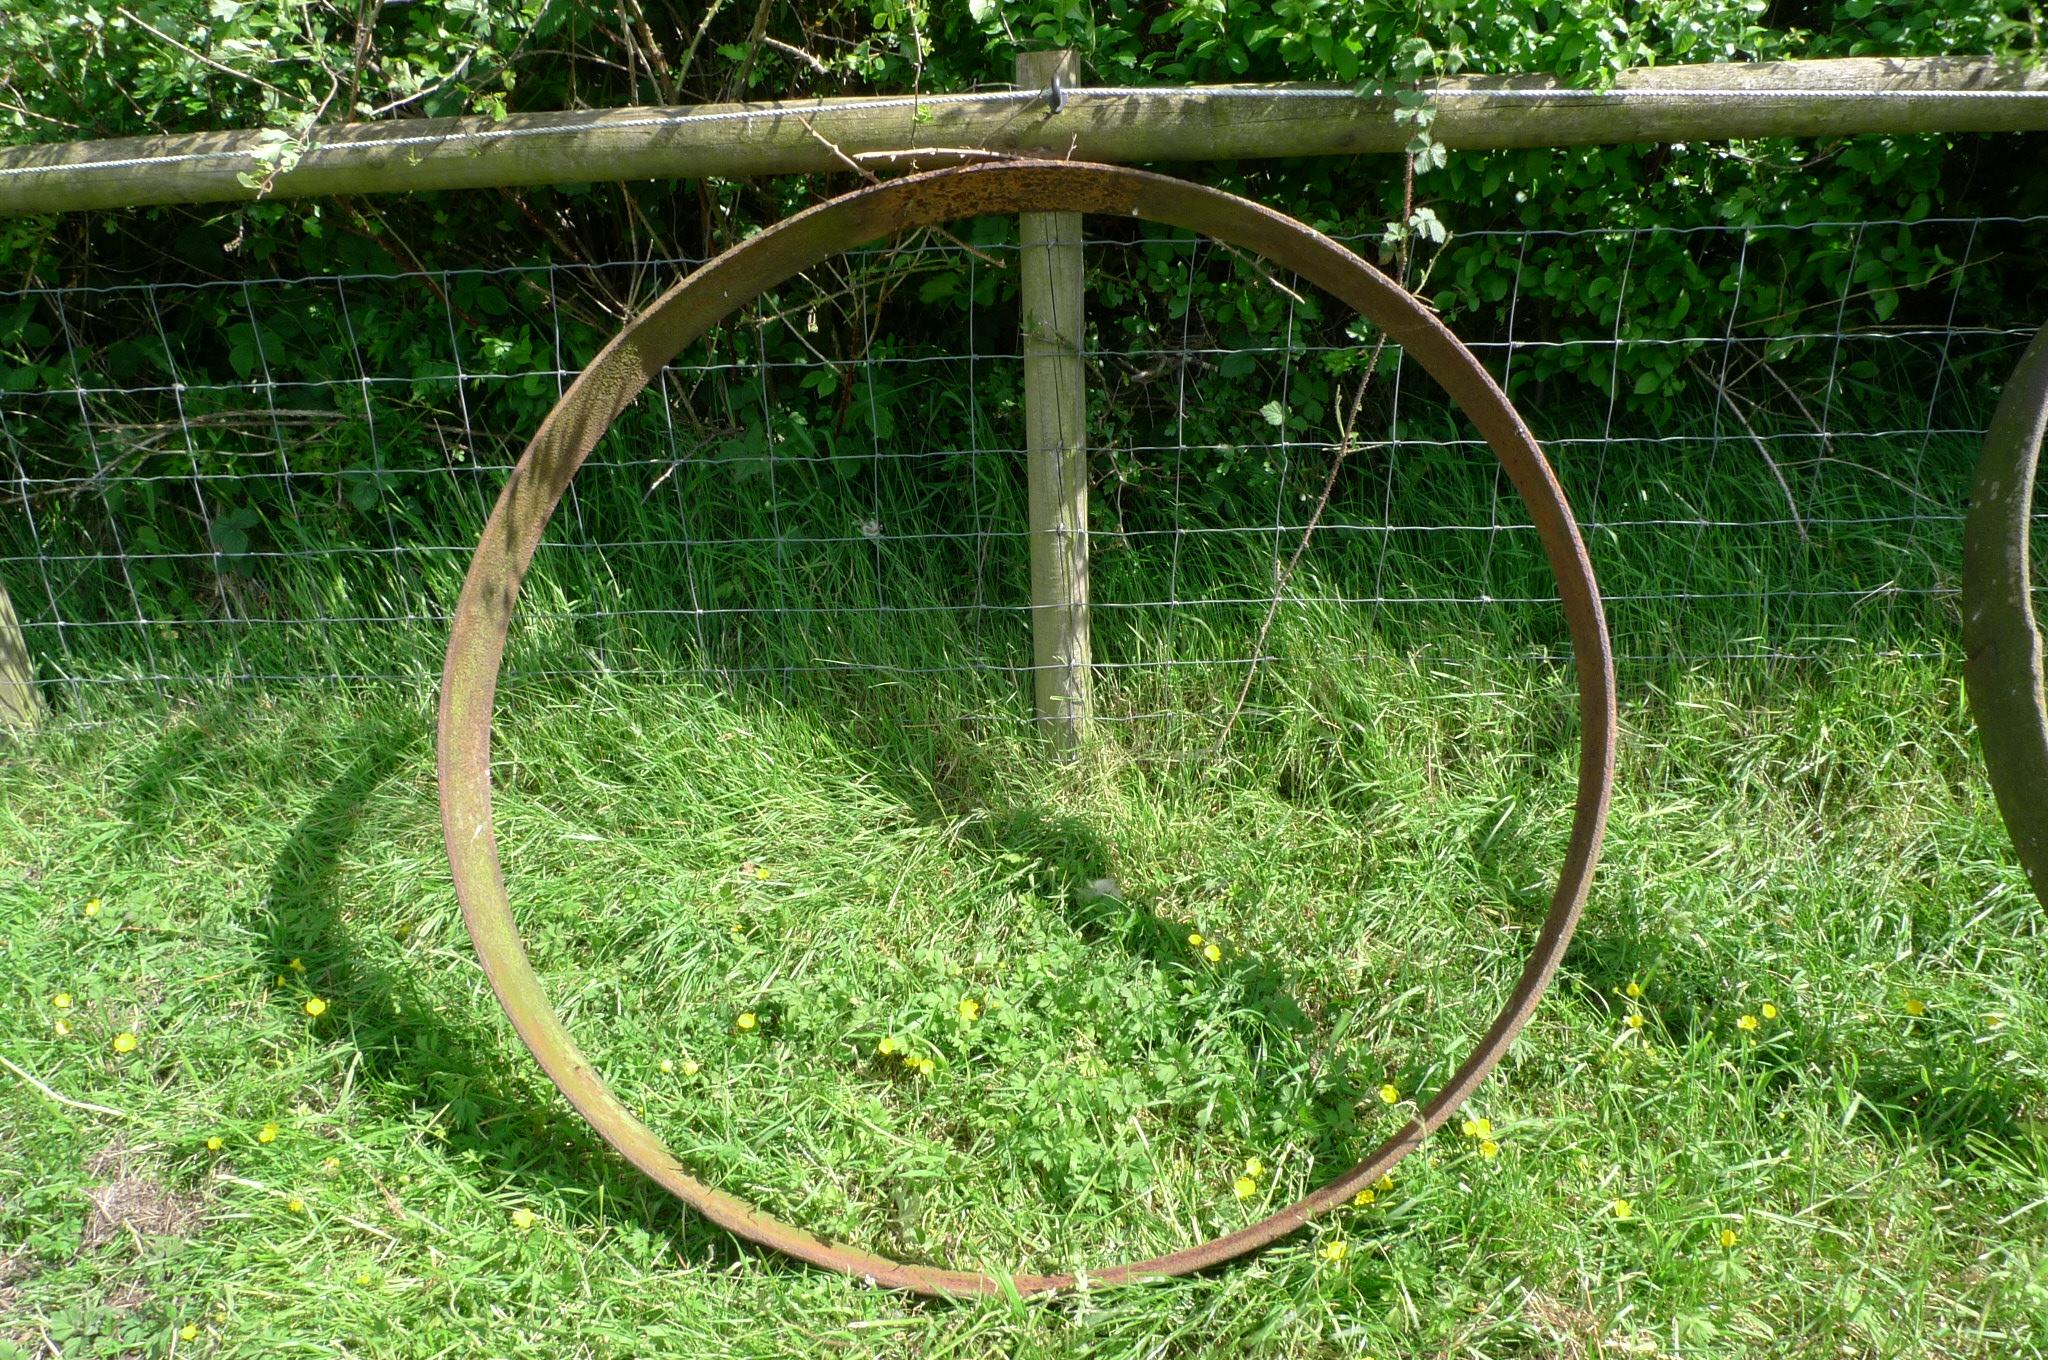 Cart wheel rim